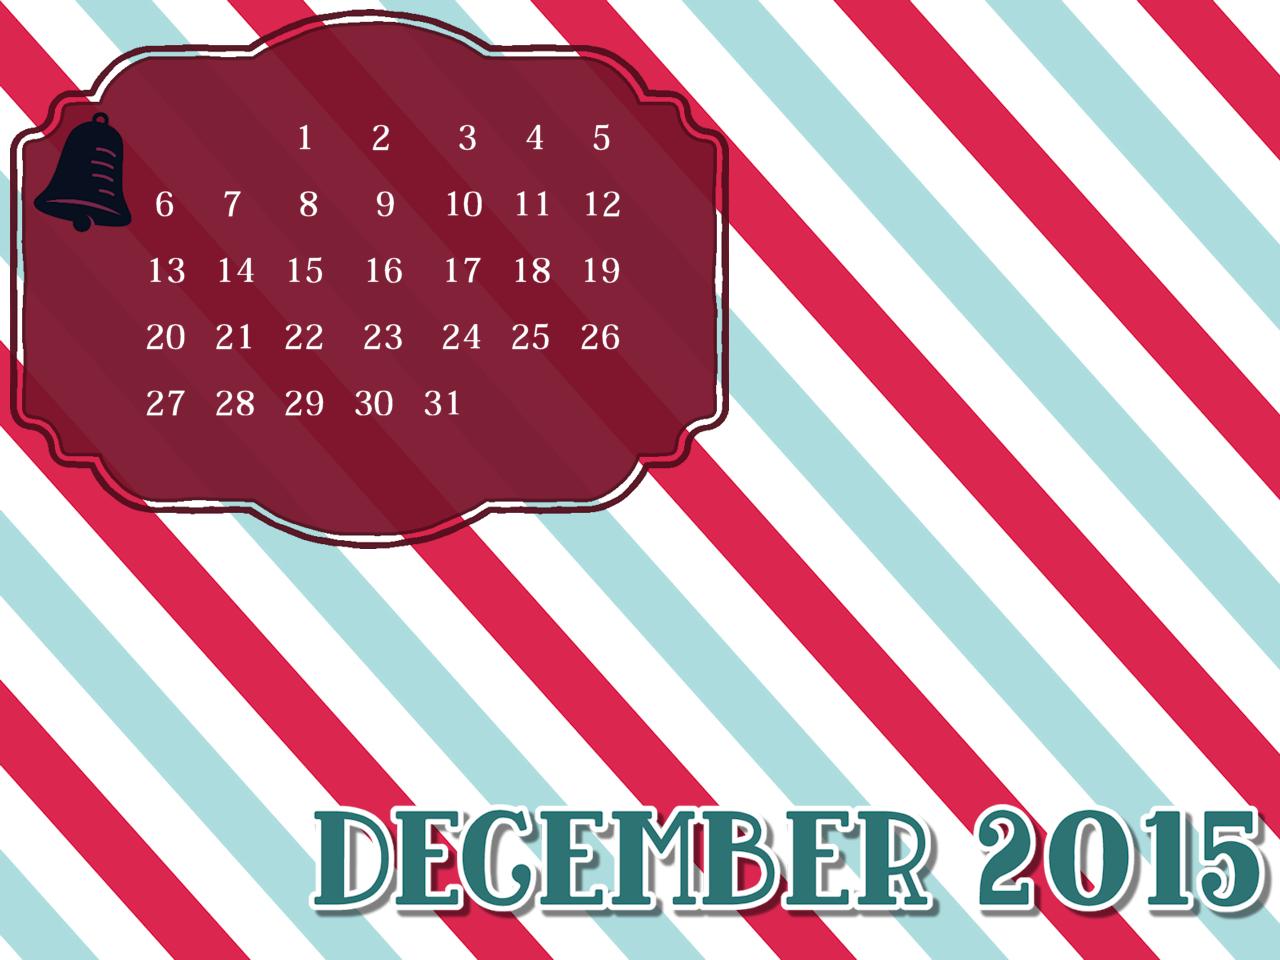 December 2015 Desktop Mobile Wallpaper